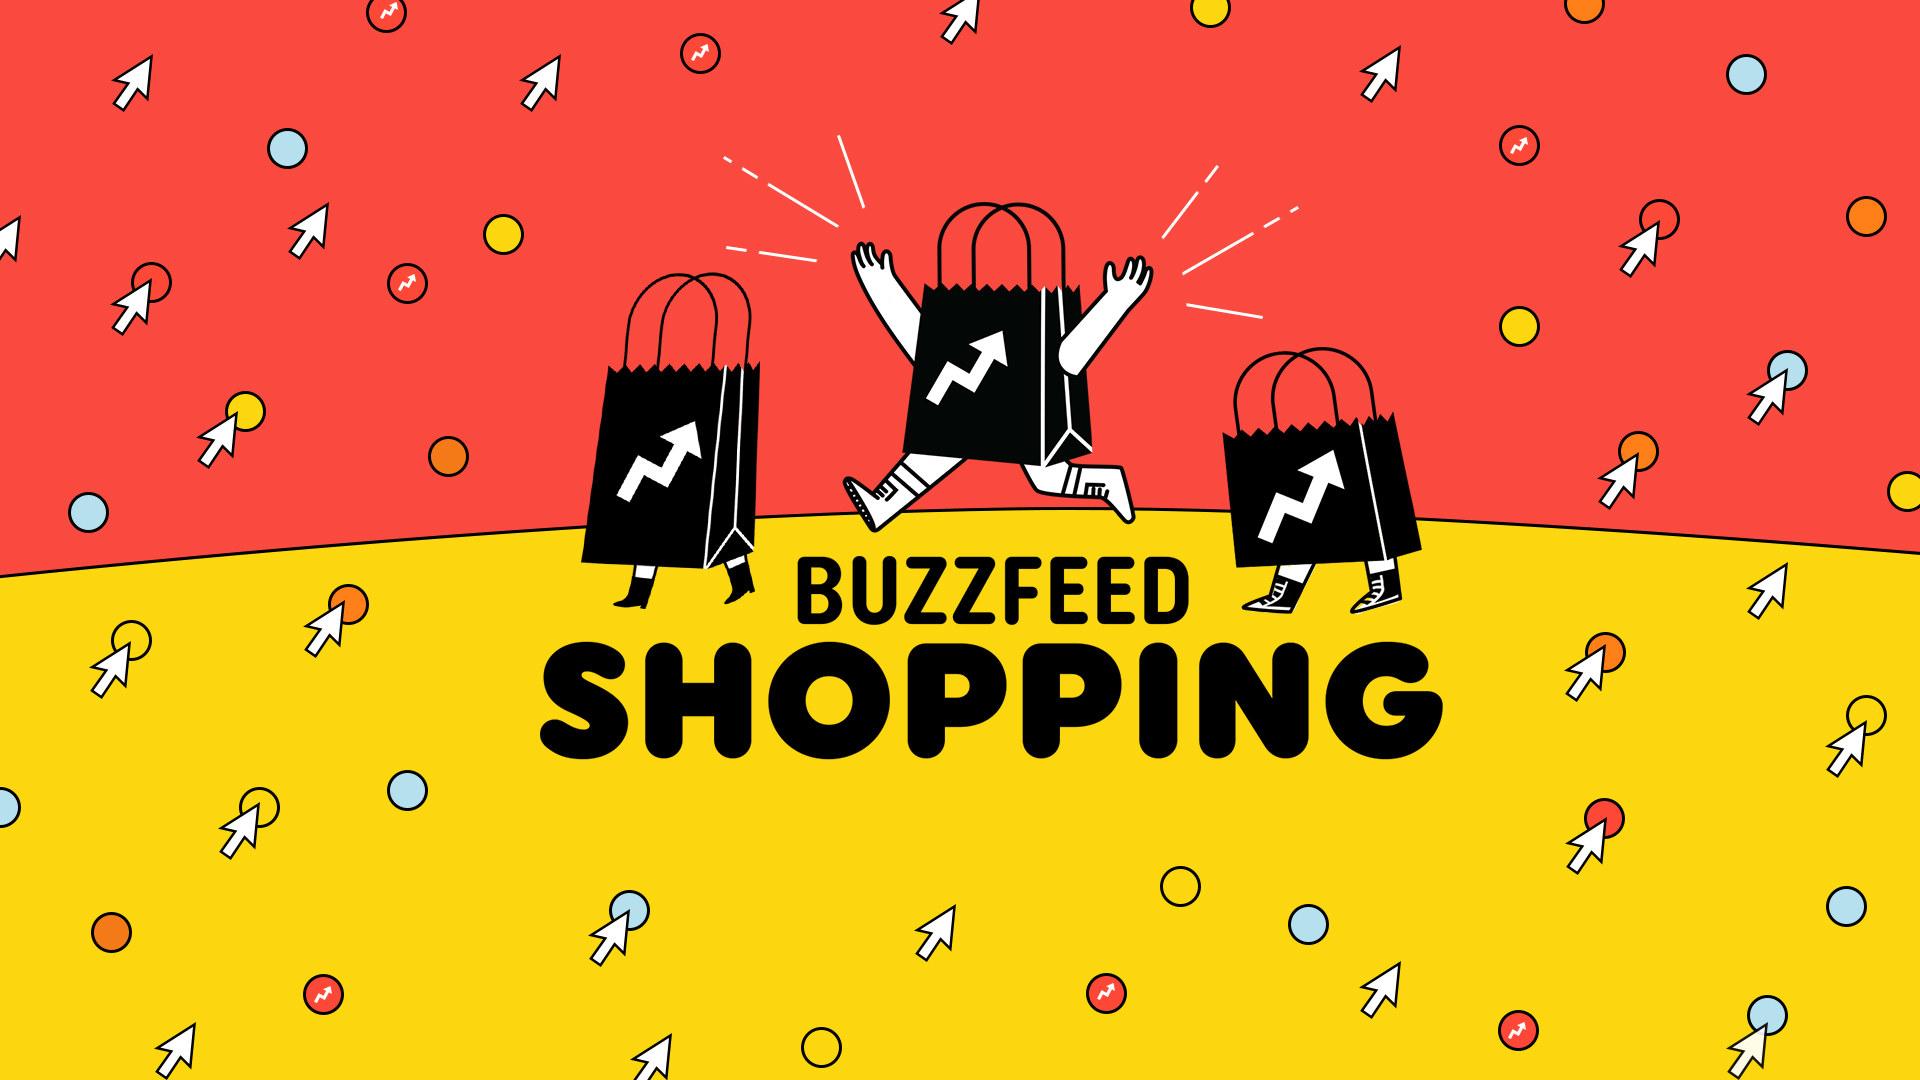 BuzzzFeed Shopping logo